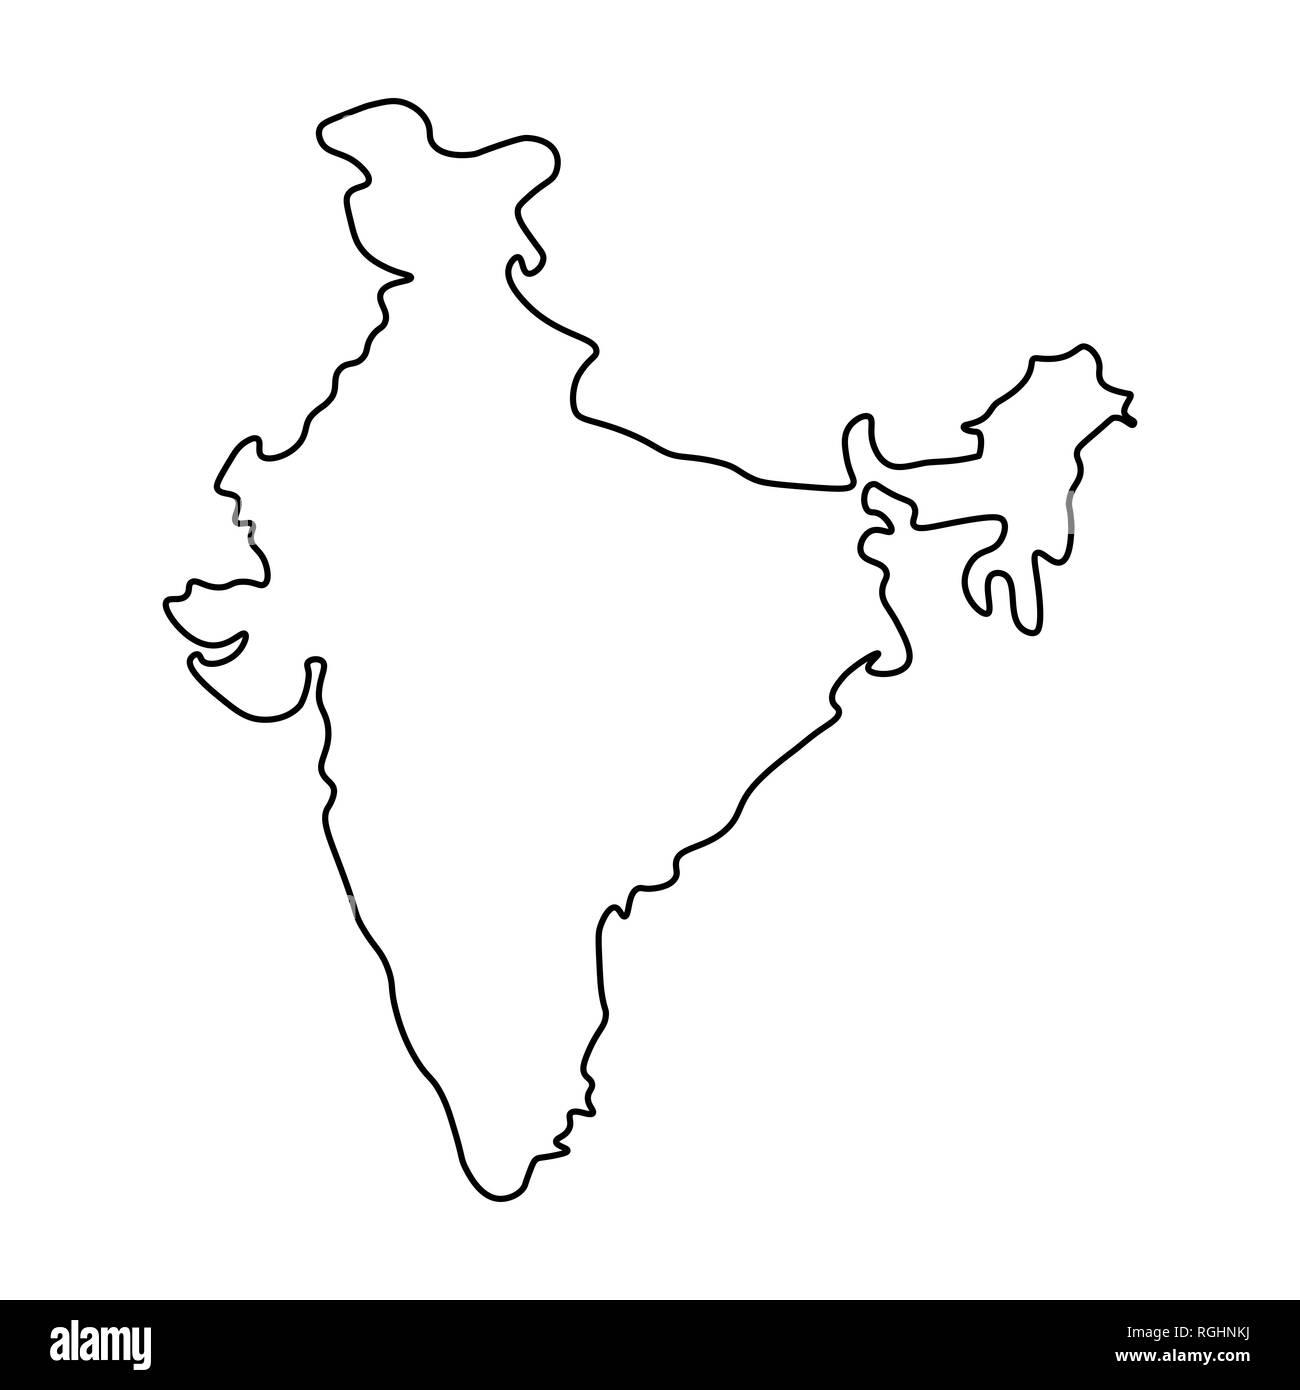 India Map Outline Stockfotos & India Map Outline Bilder - Alamy